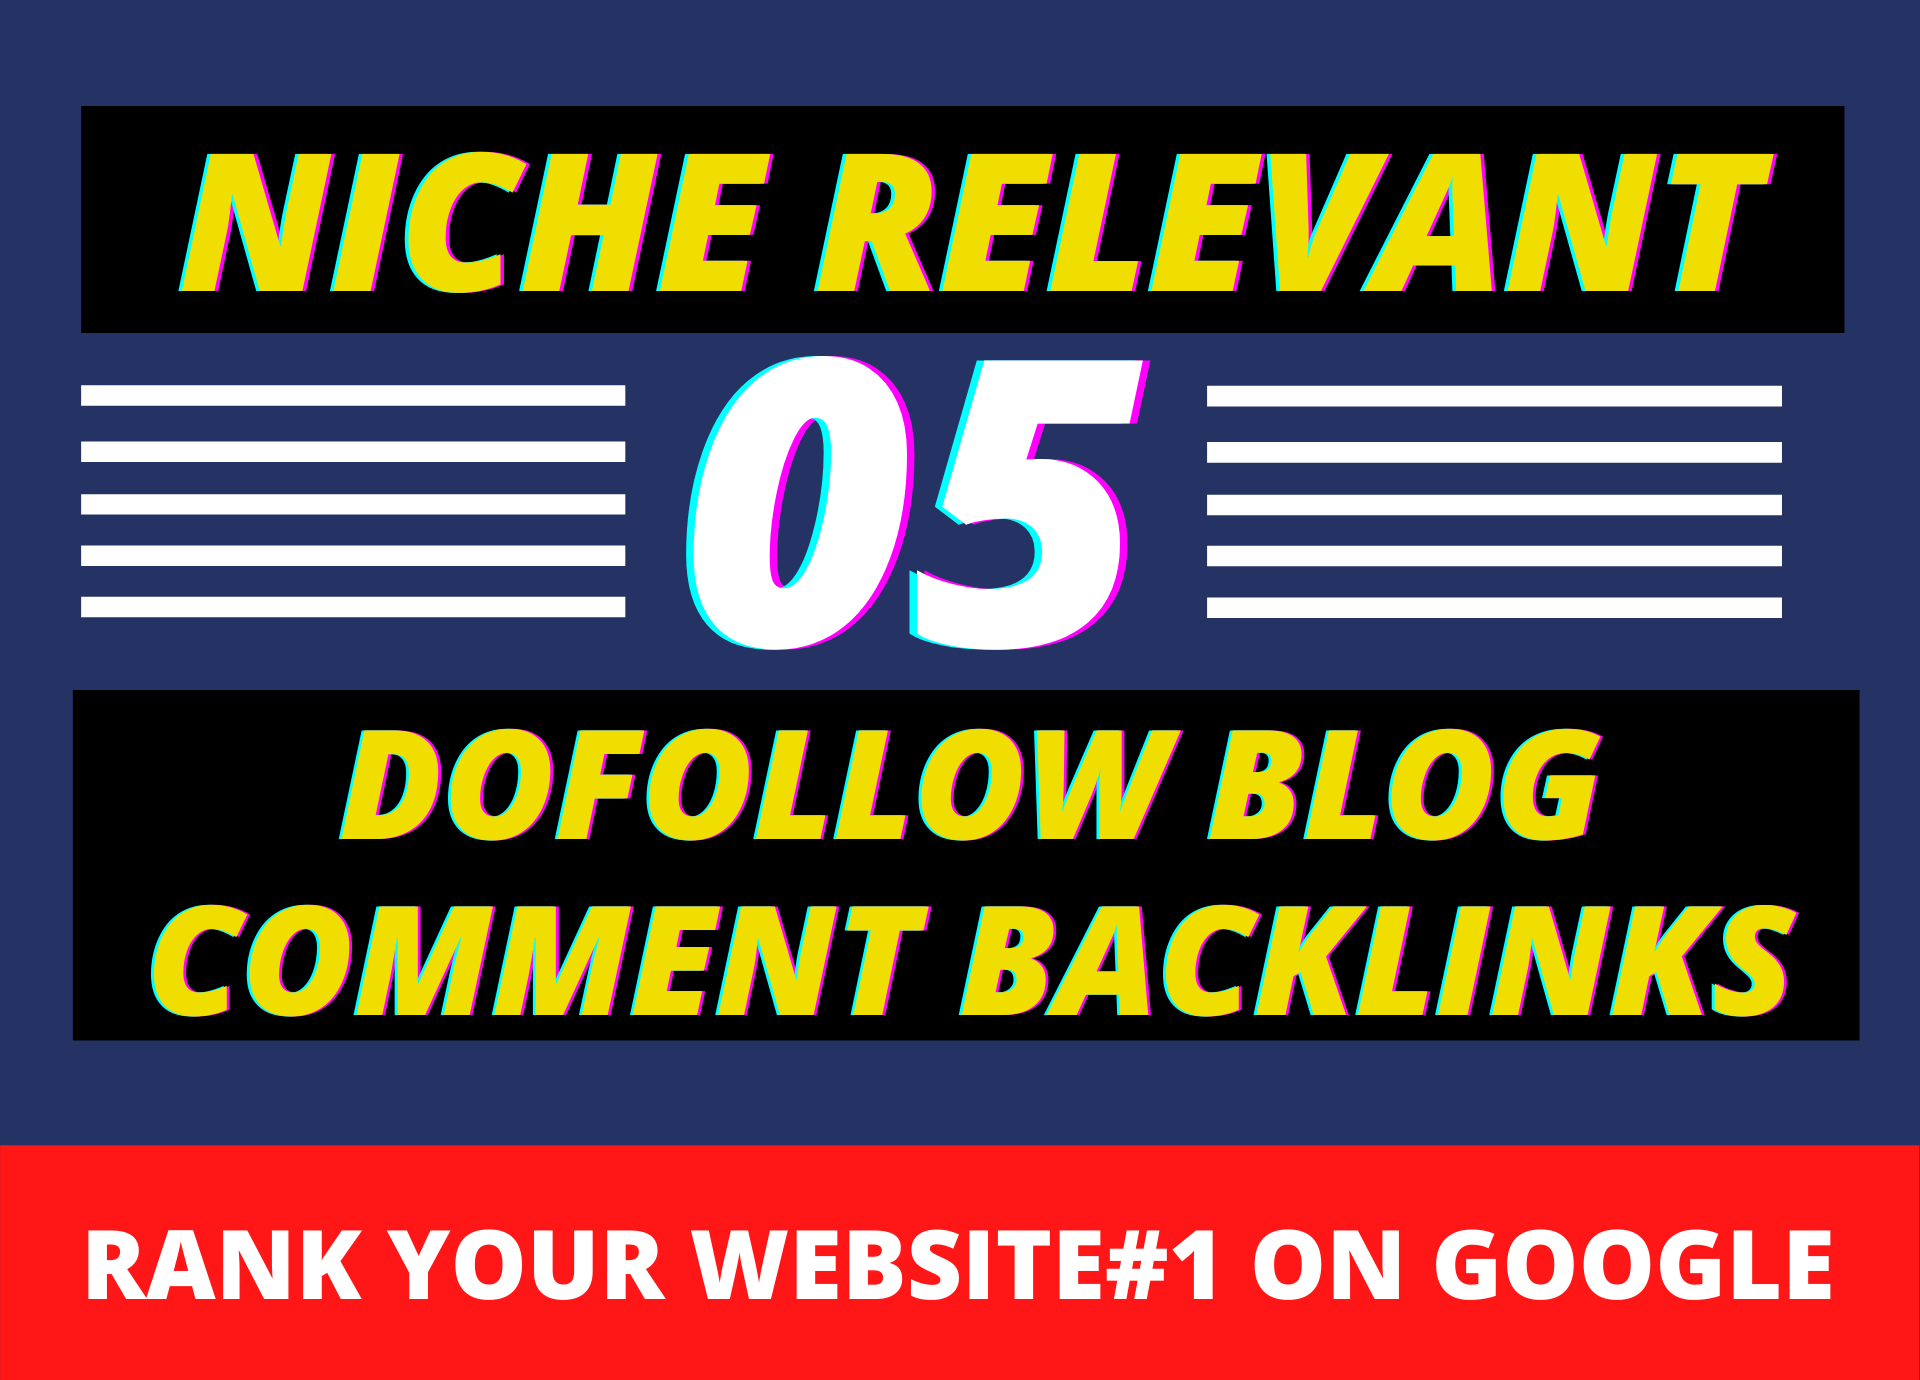 i will provide 05 niche relevant dofollow blog comment backlinks